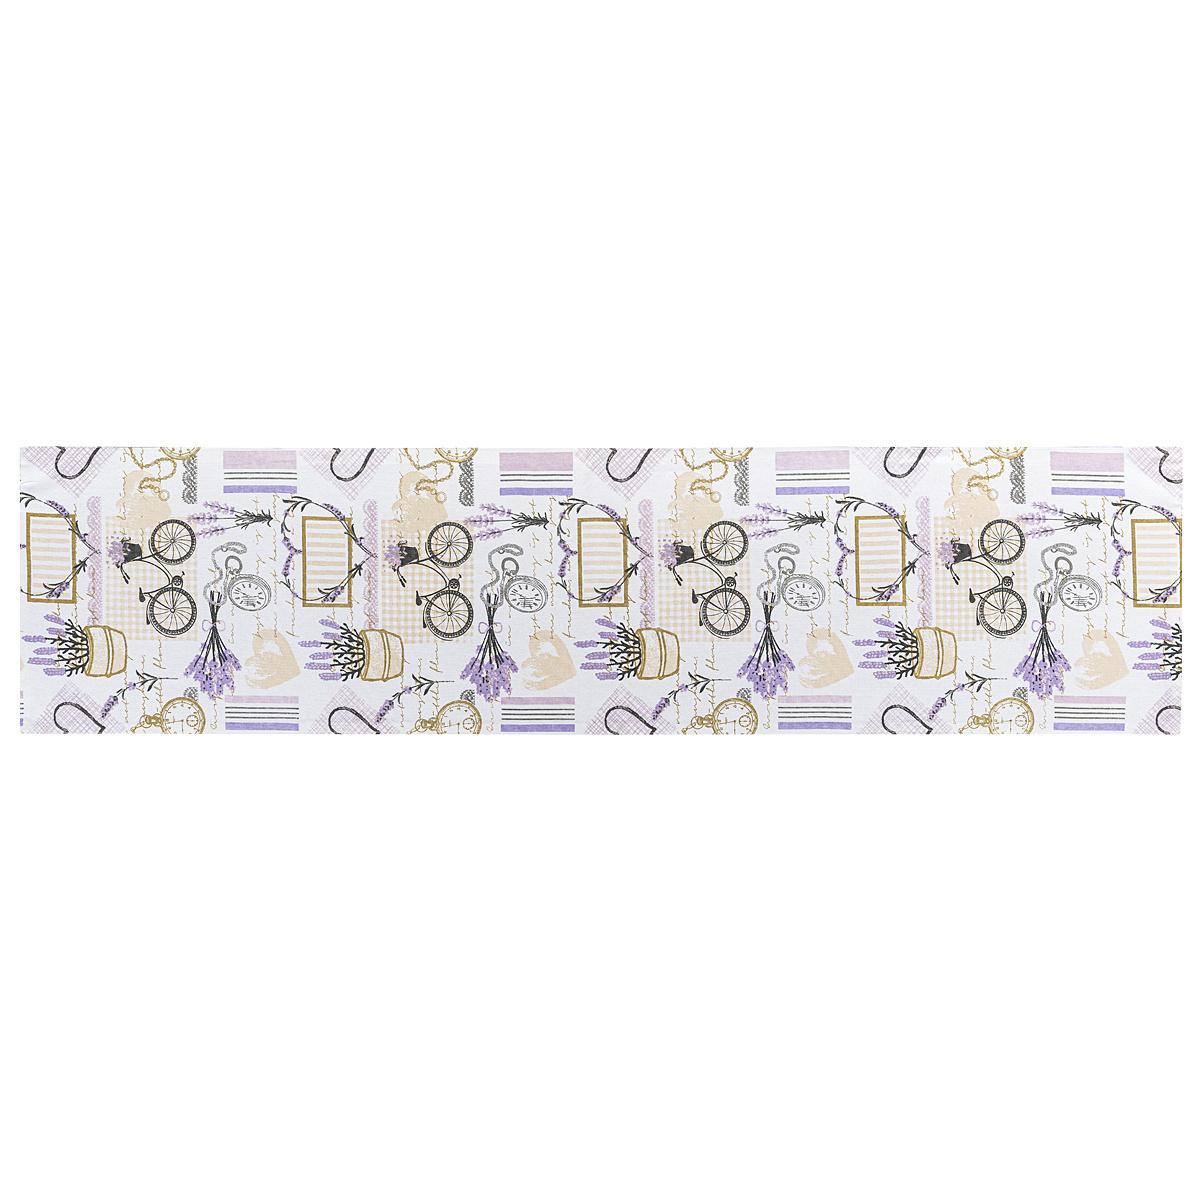 4Home Bieżnik Lavender, 33 x 130 cm